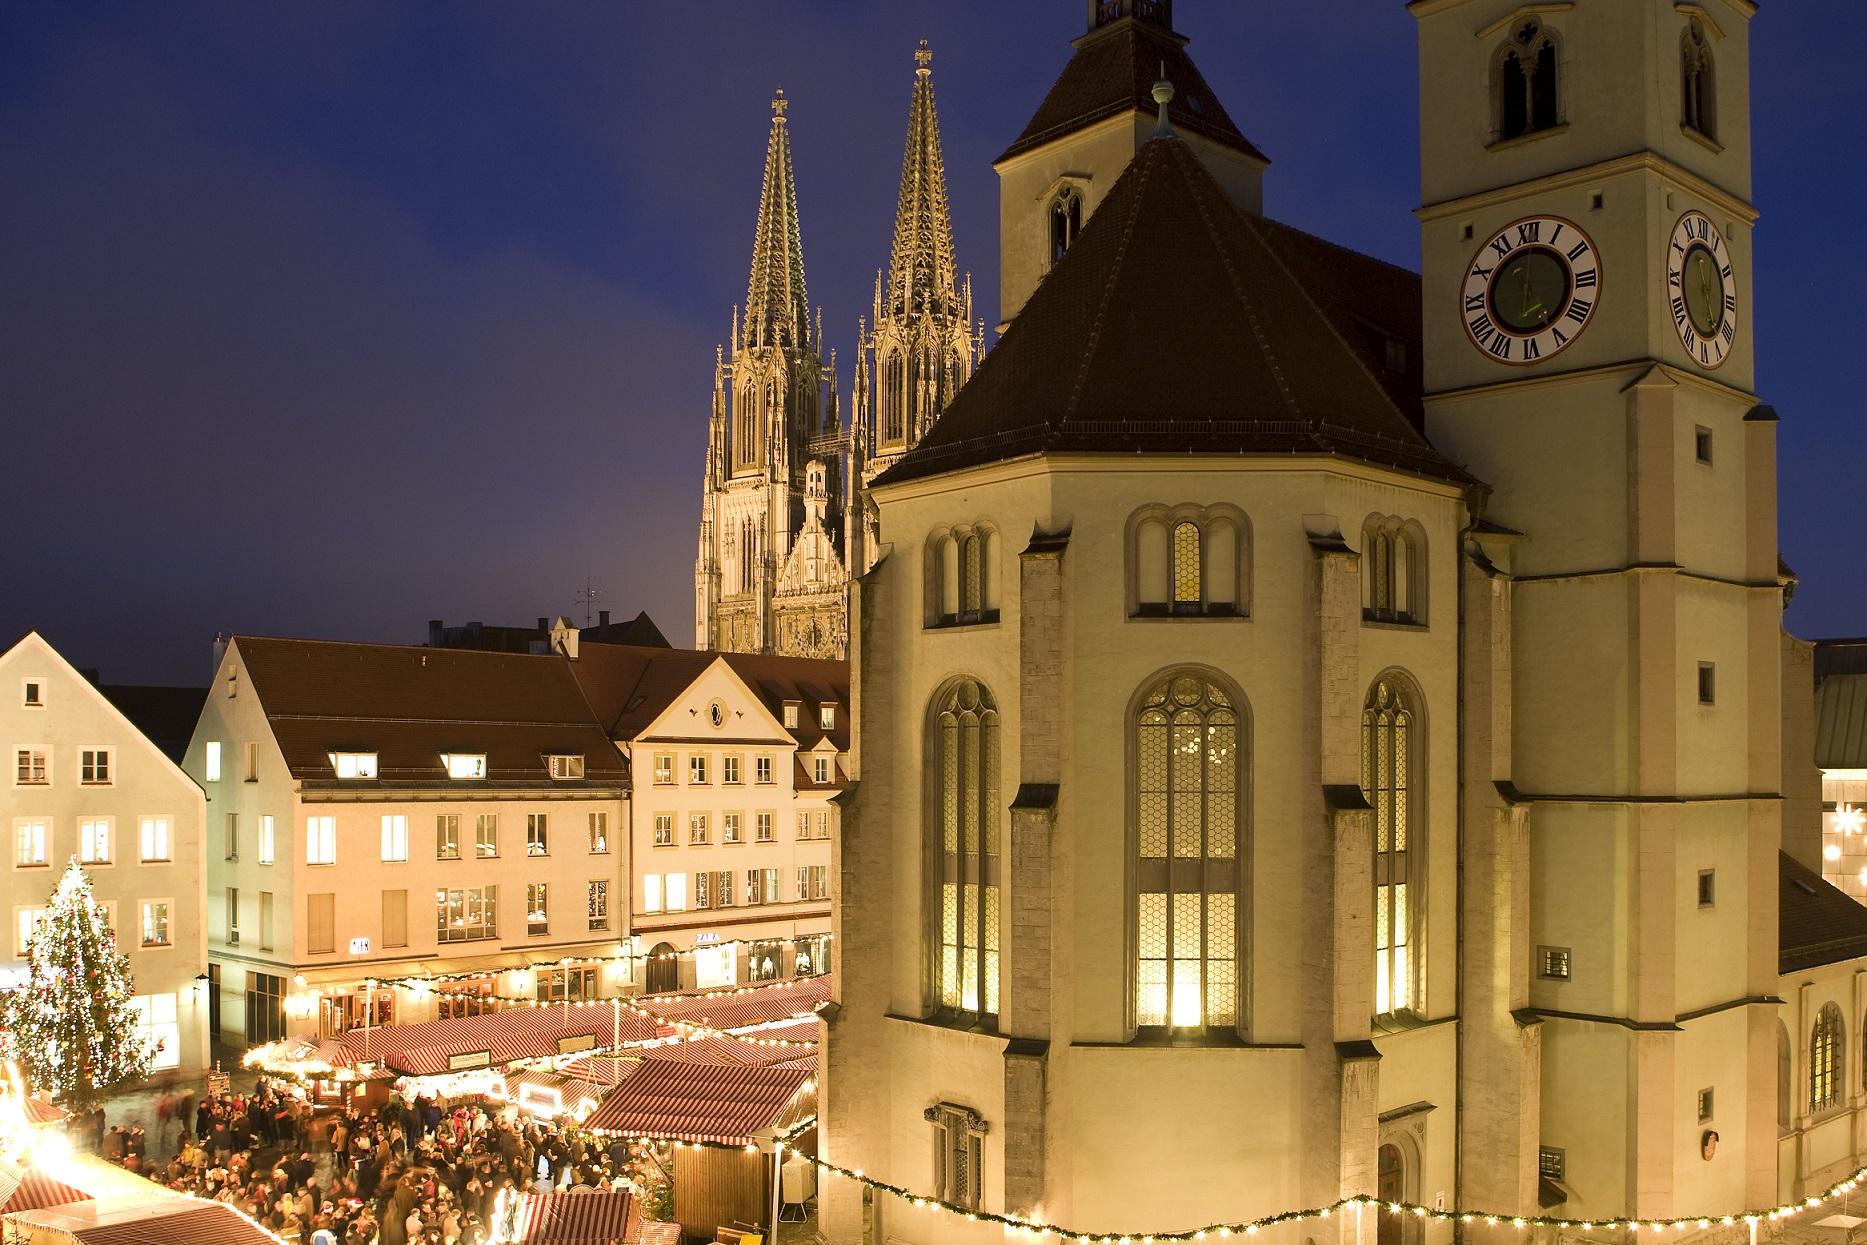 hotel_bad_abbach_ausflugsziel_regensburg_christkindlmarkt_neupfarrplatz